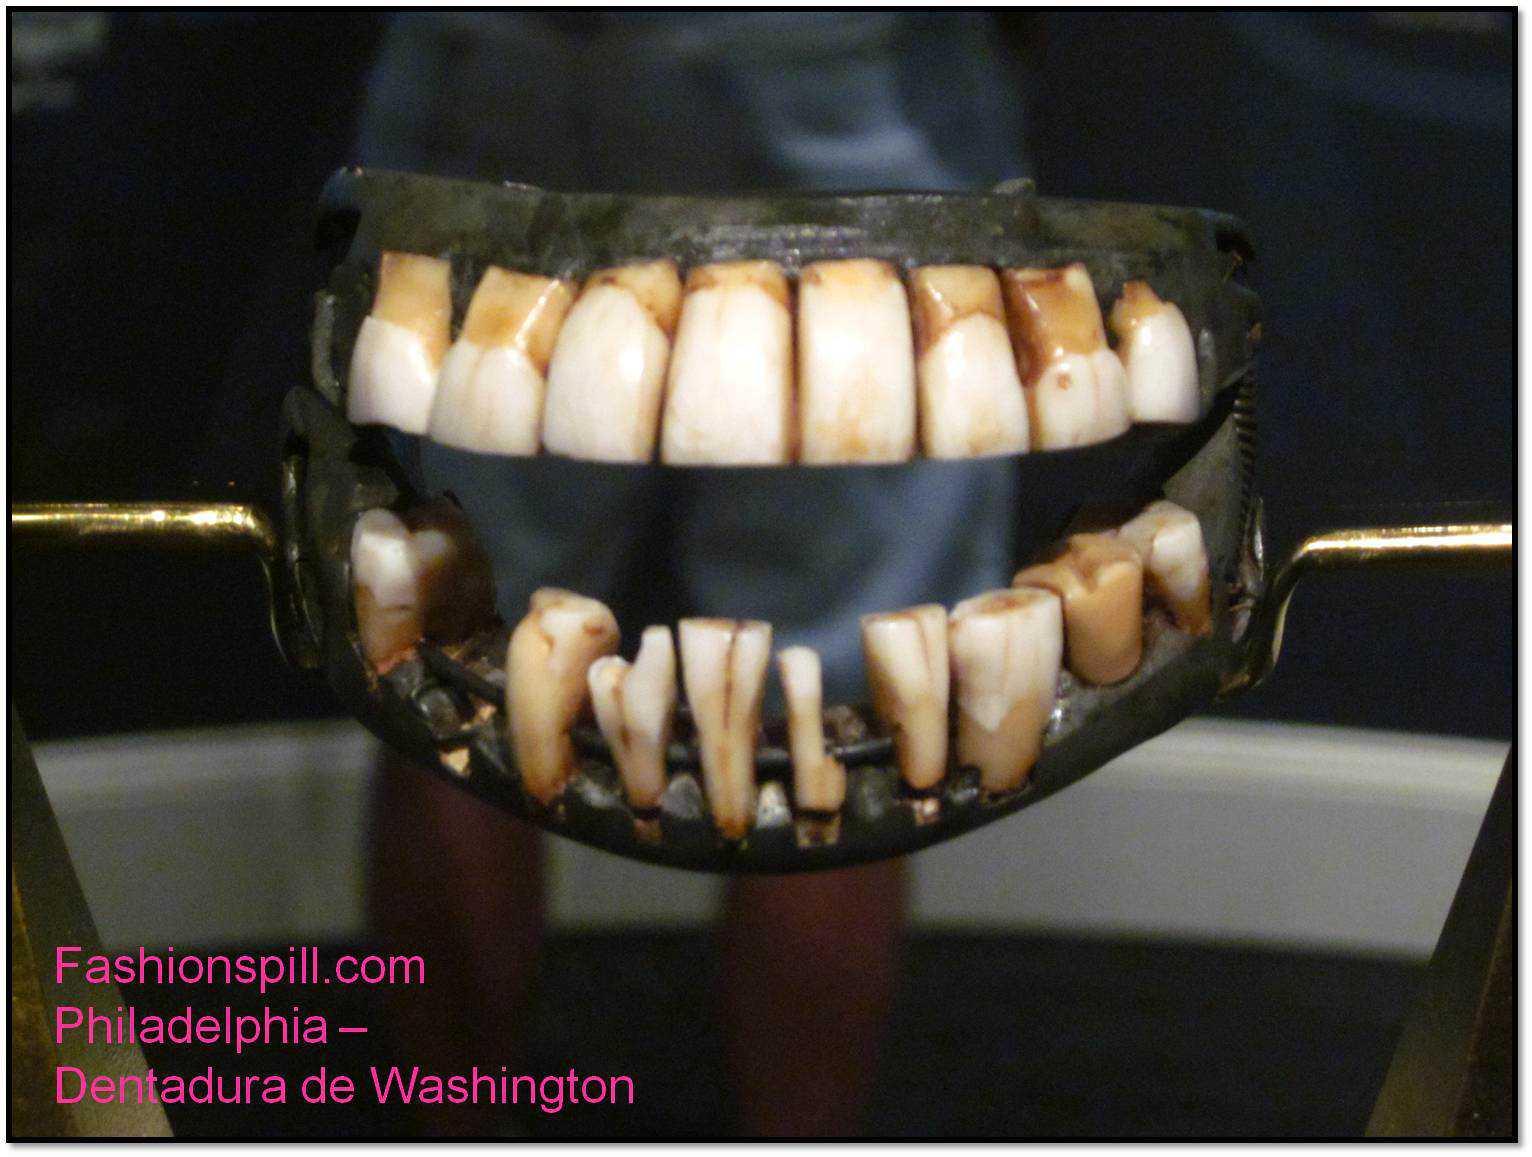 philadelphia dentadura de washington 15 bizarrices envolvendo dentes